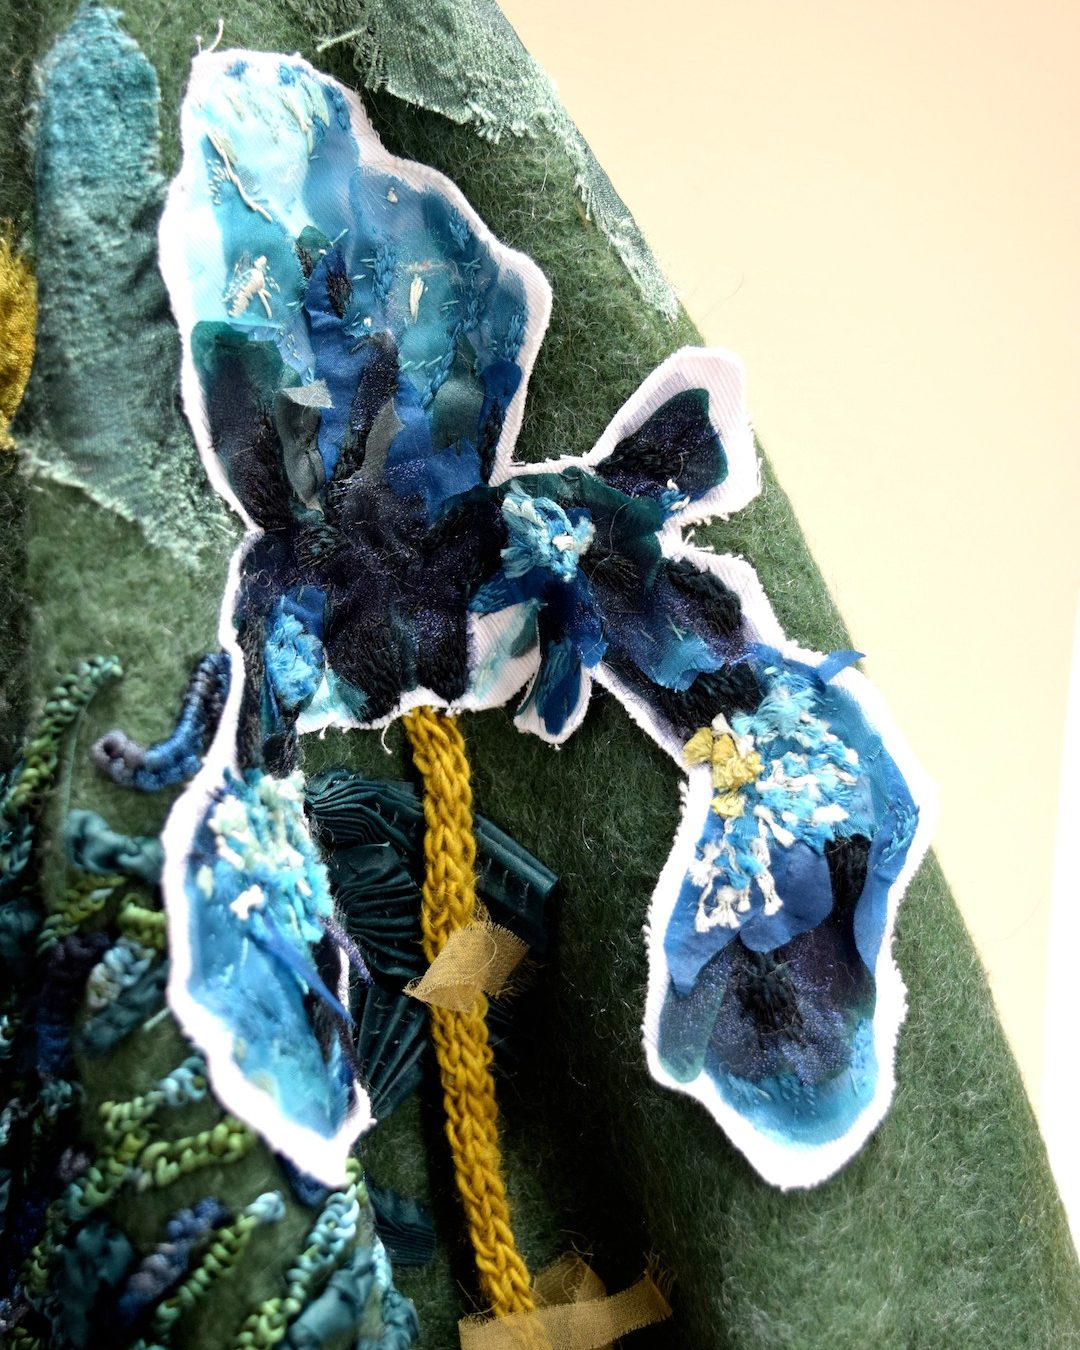 Into The Graden Formal Garden Blanket Embroidery 05